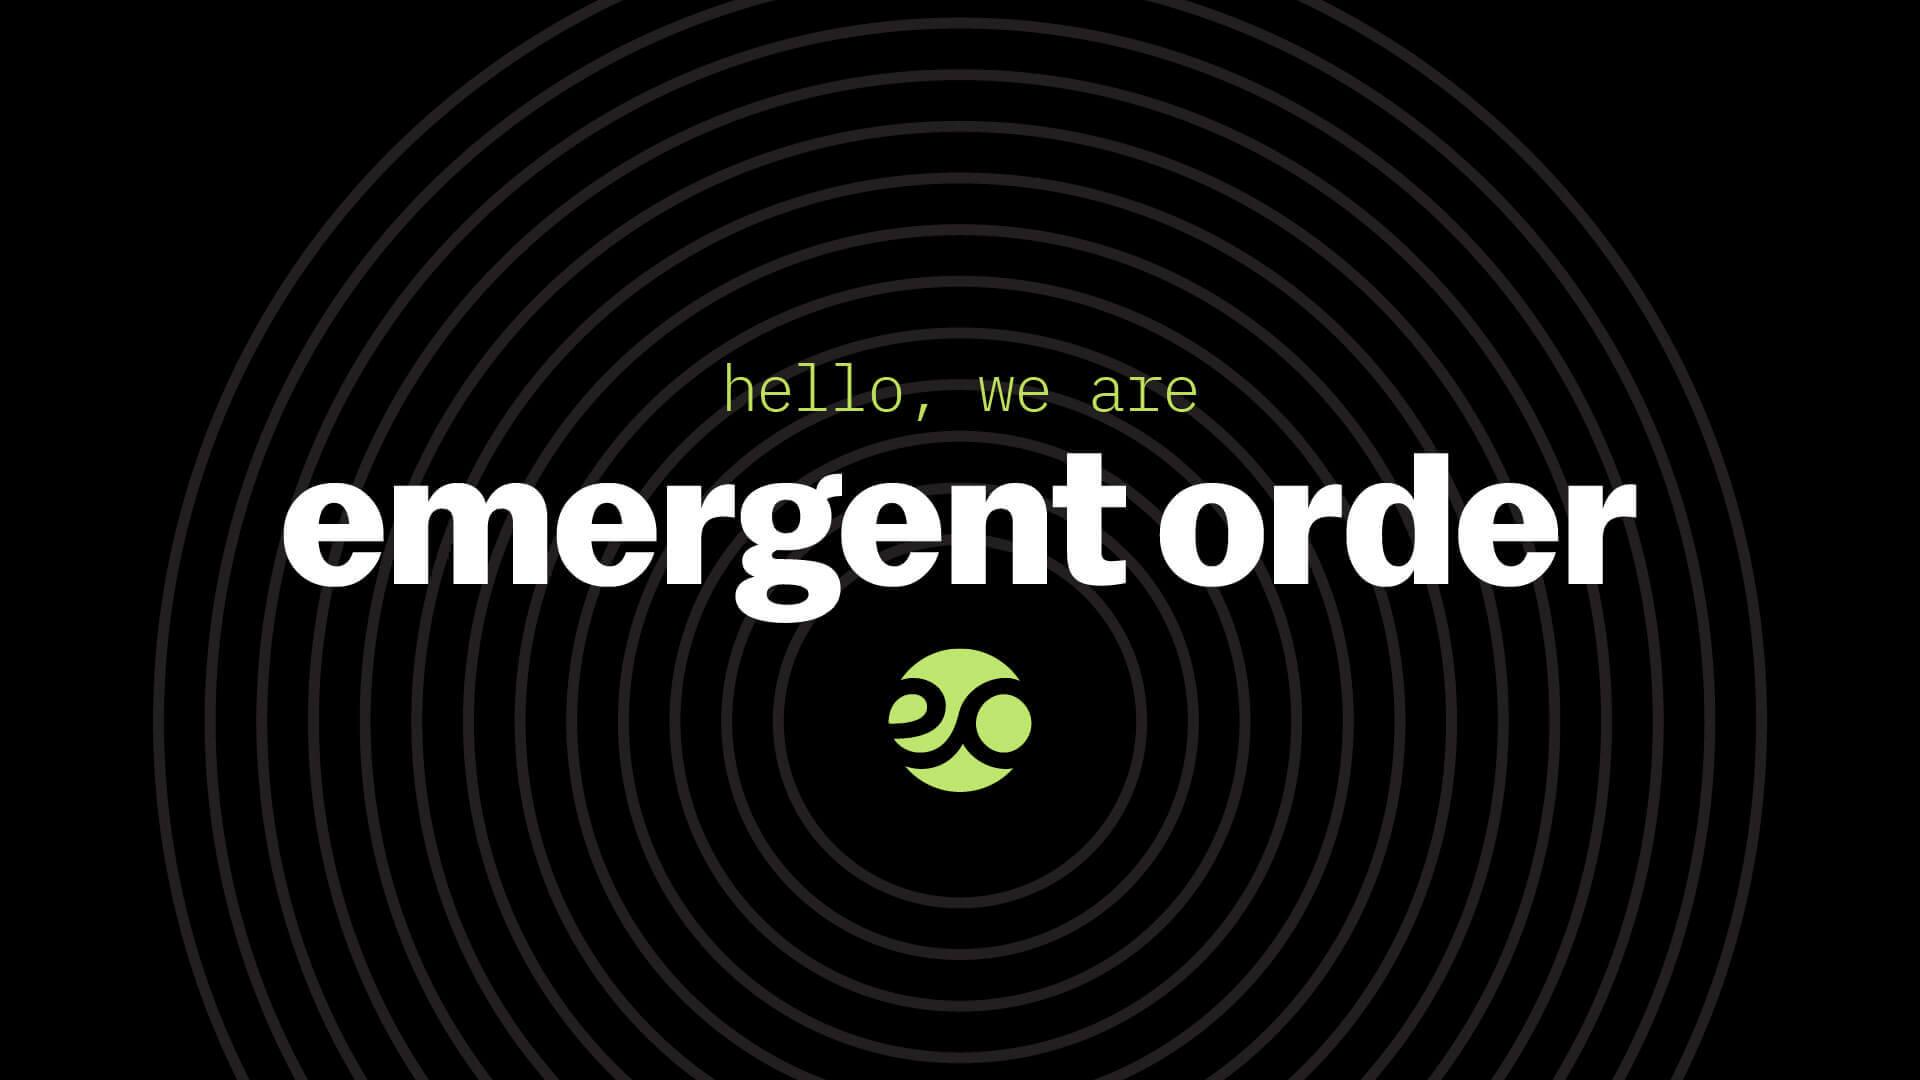 studio-malagon-emergent-order-brand-hello